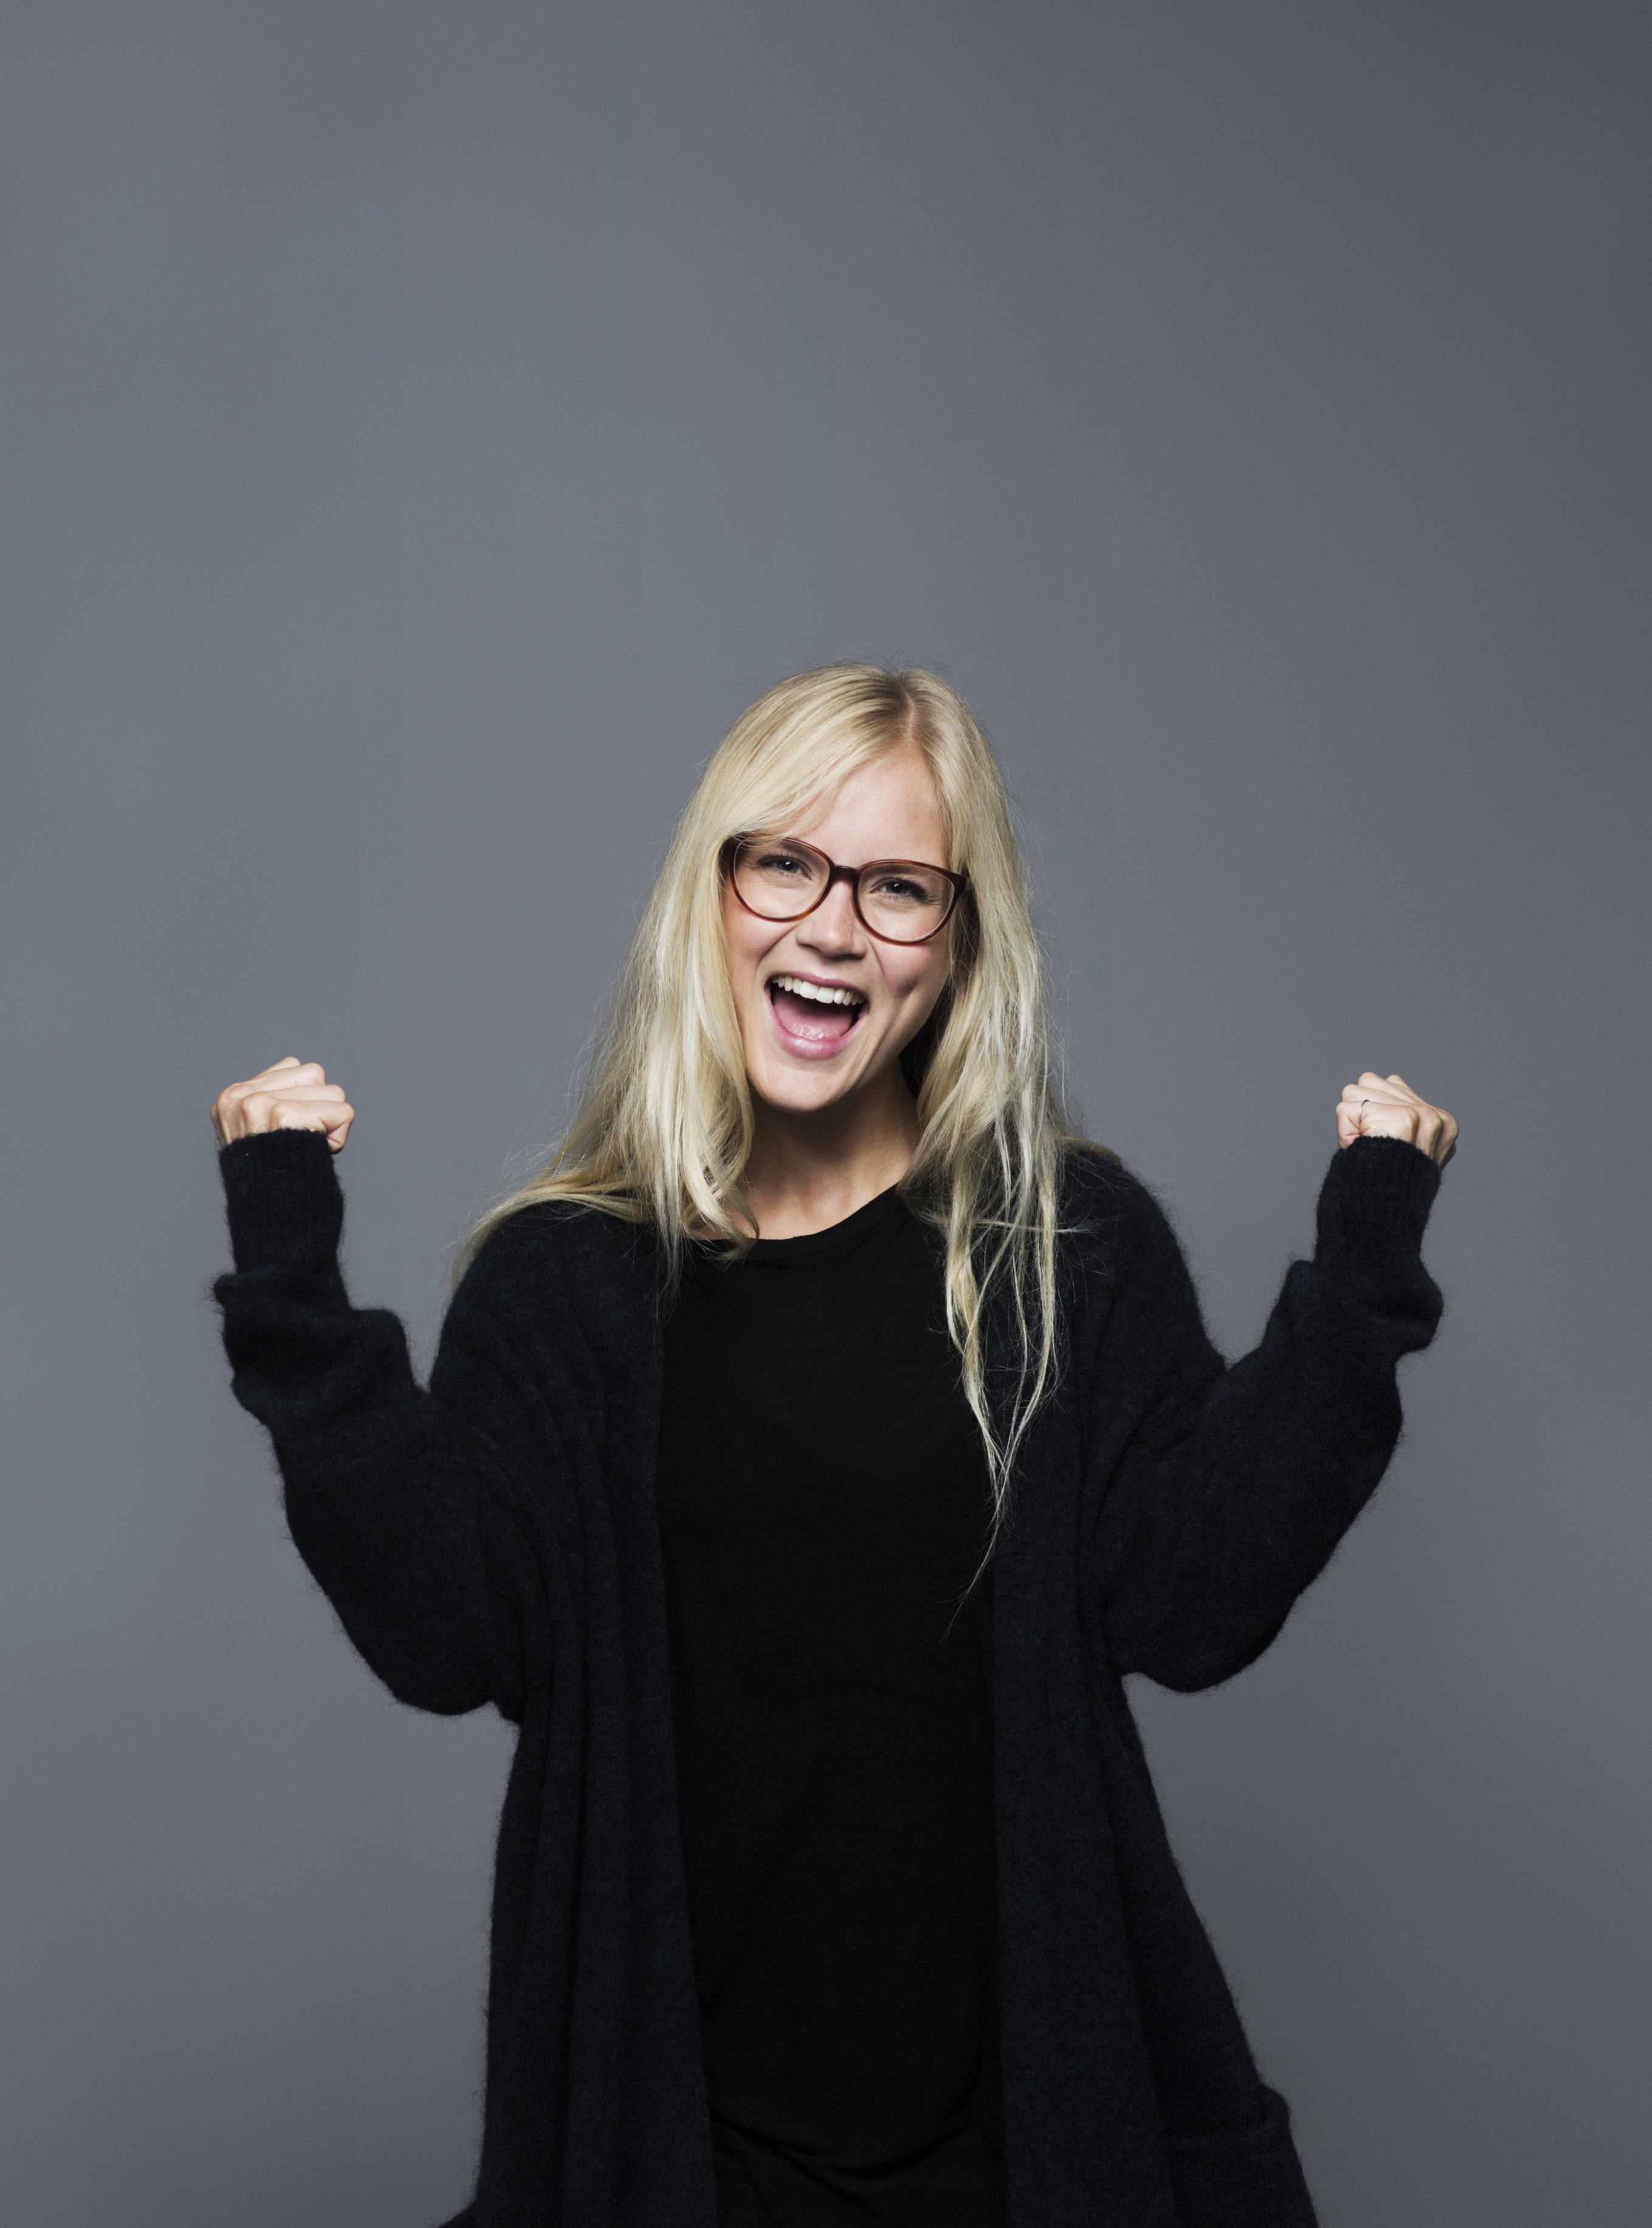 Portrait of young woman dancing, studio background